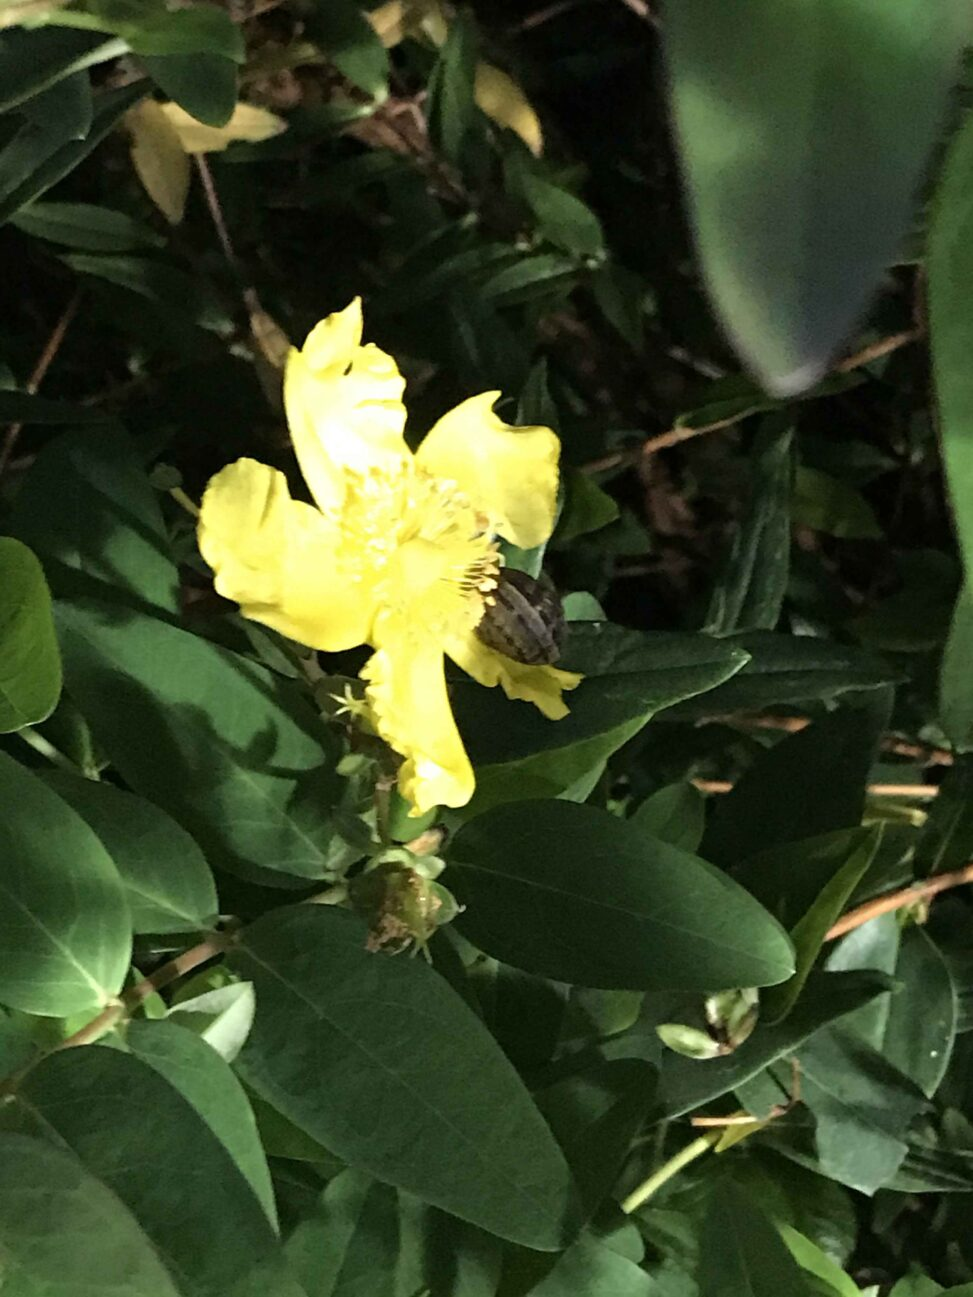 Templebreedy Hypericum Calycinum-Cepaea Nemoralis Snail